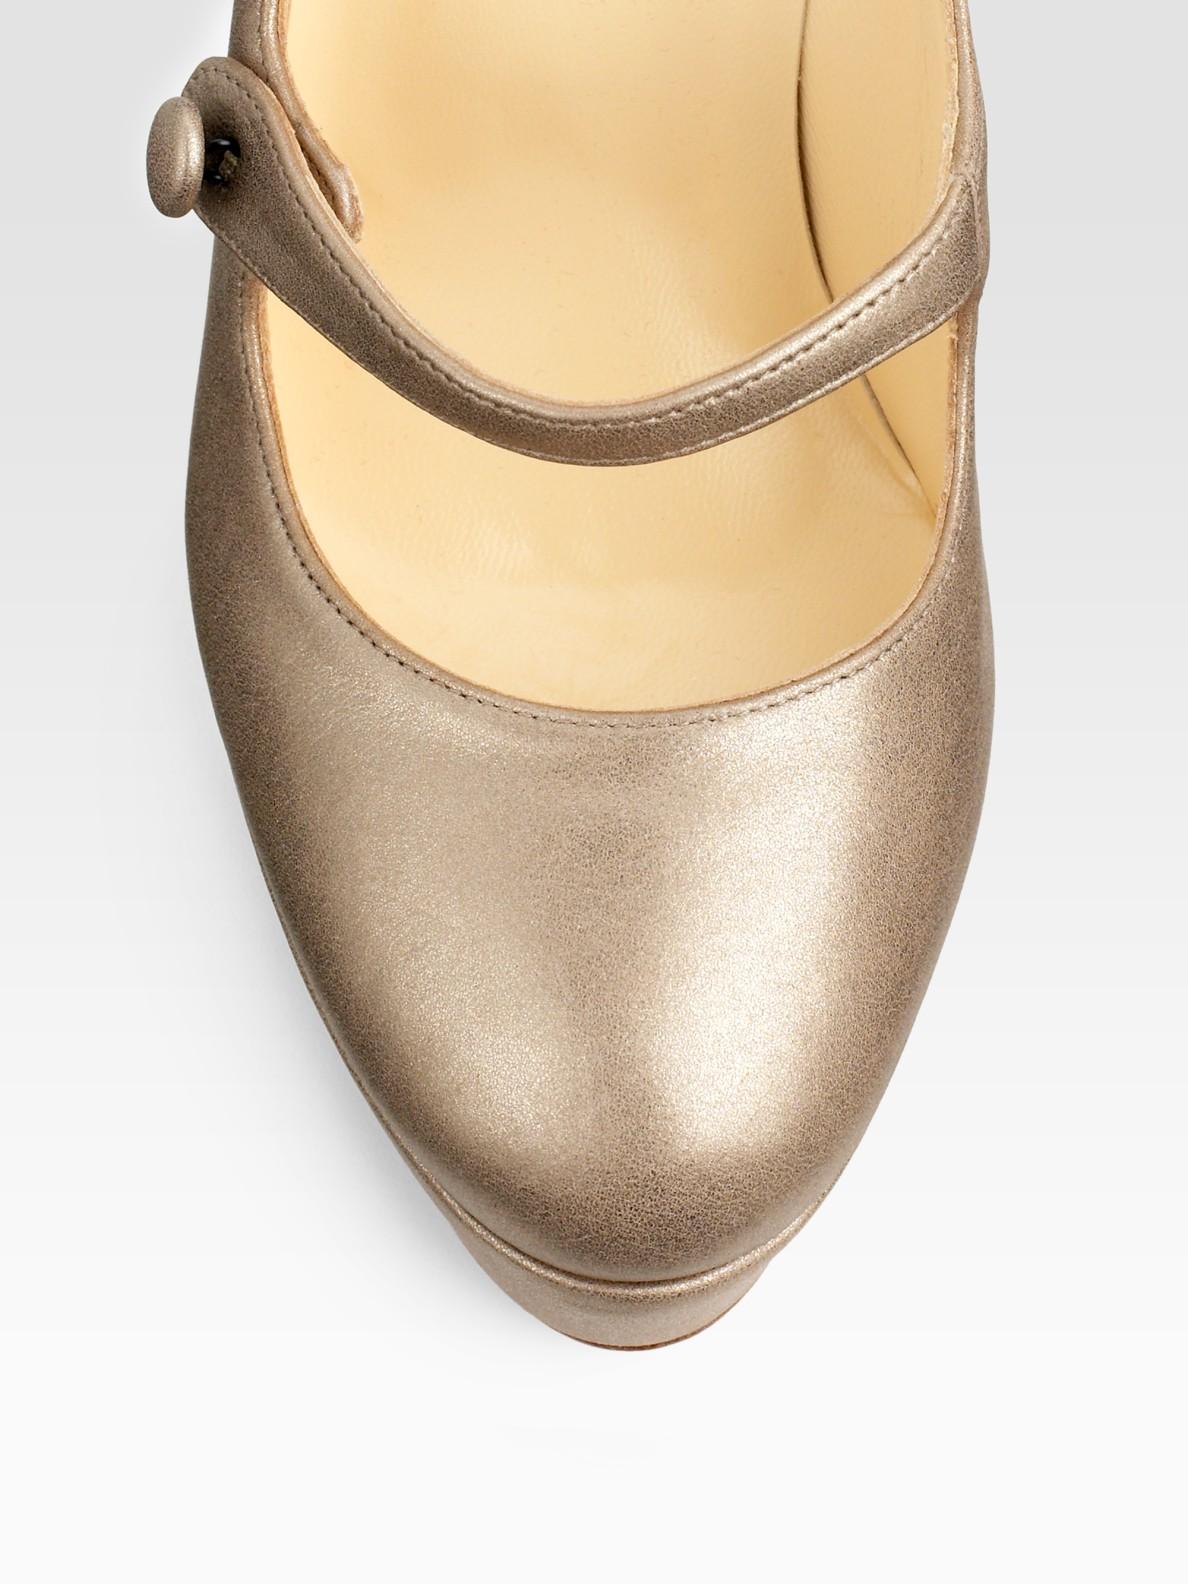 7b238e9ddd6 ... store christian louboutin shoes bloomingdales eca4a 6acbe ...